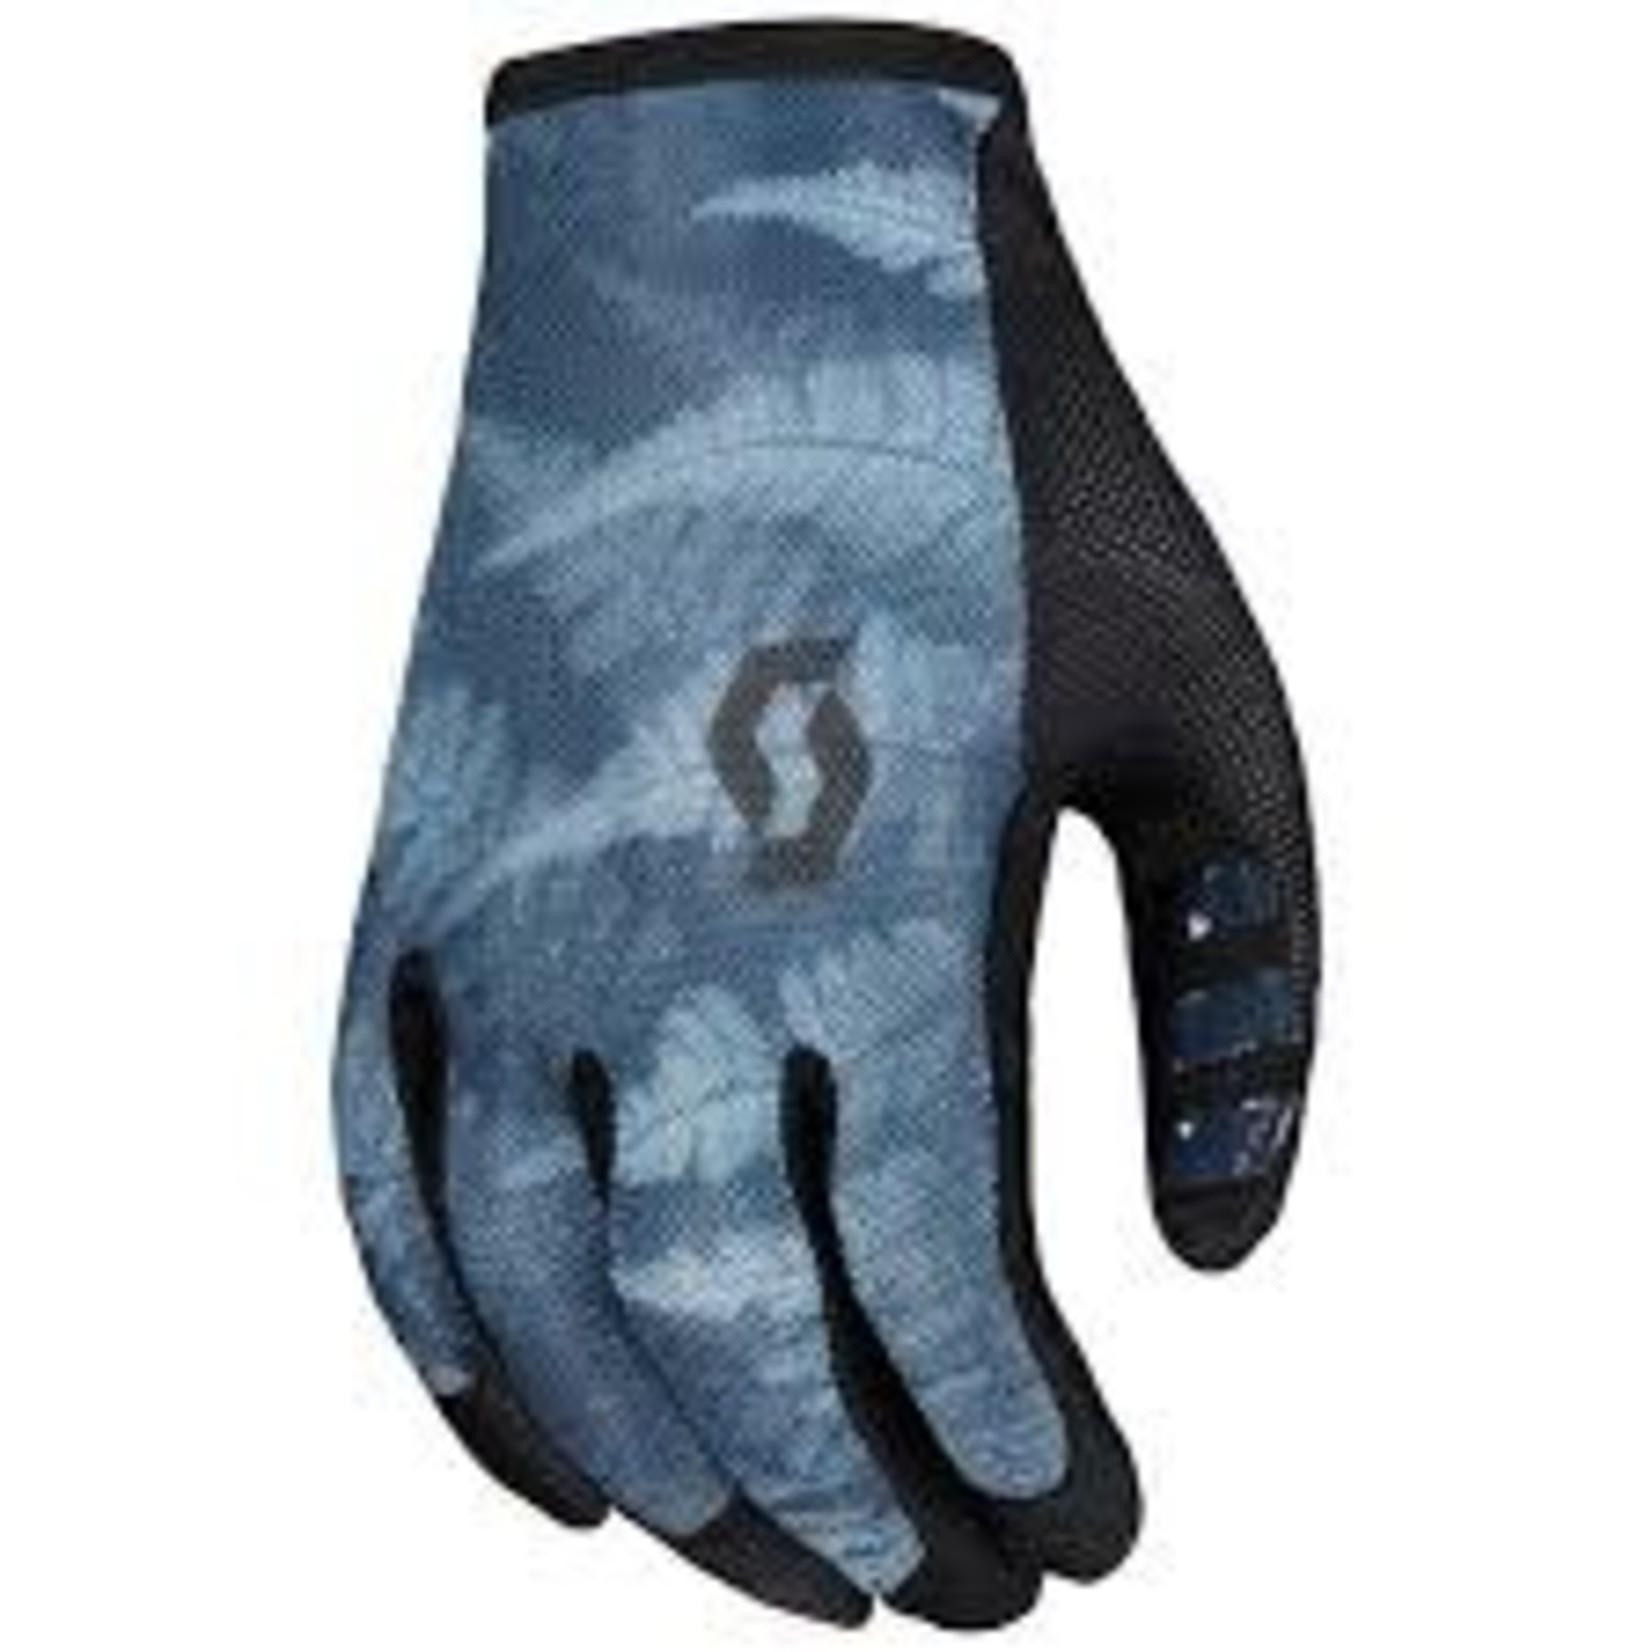 Scott SCO Glove Traction LF